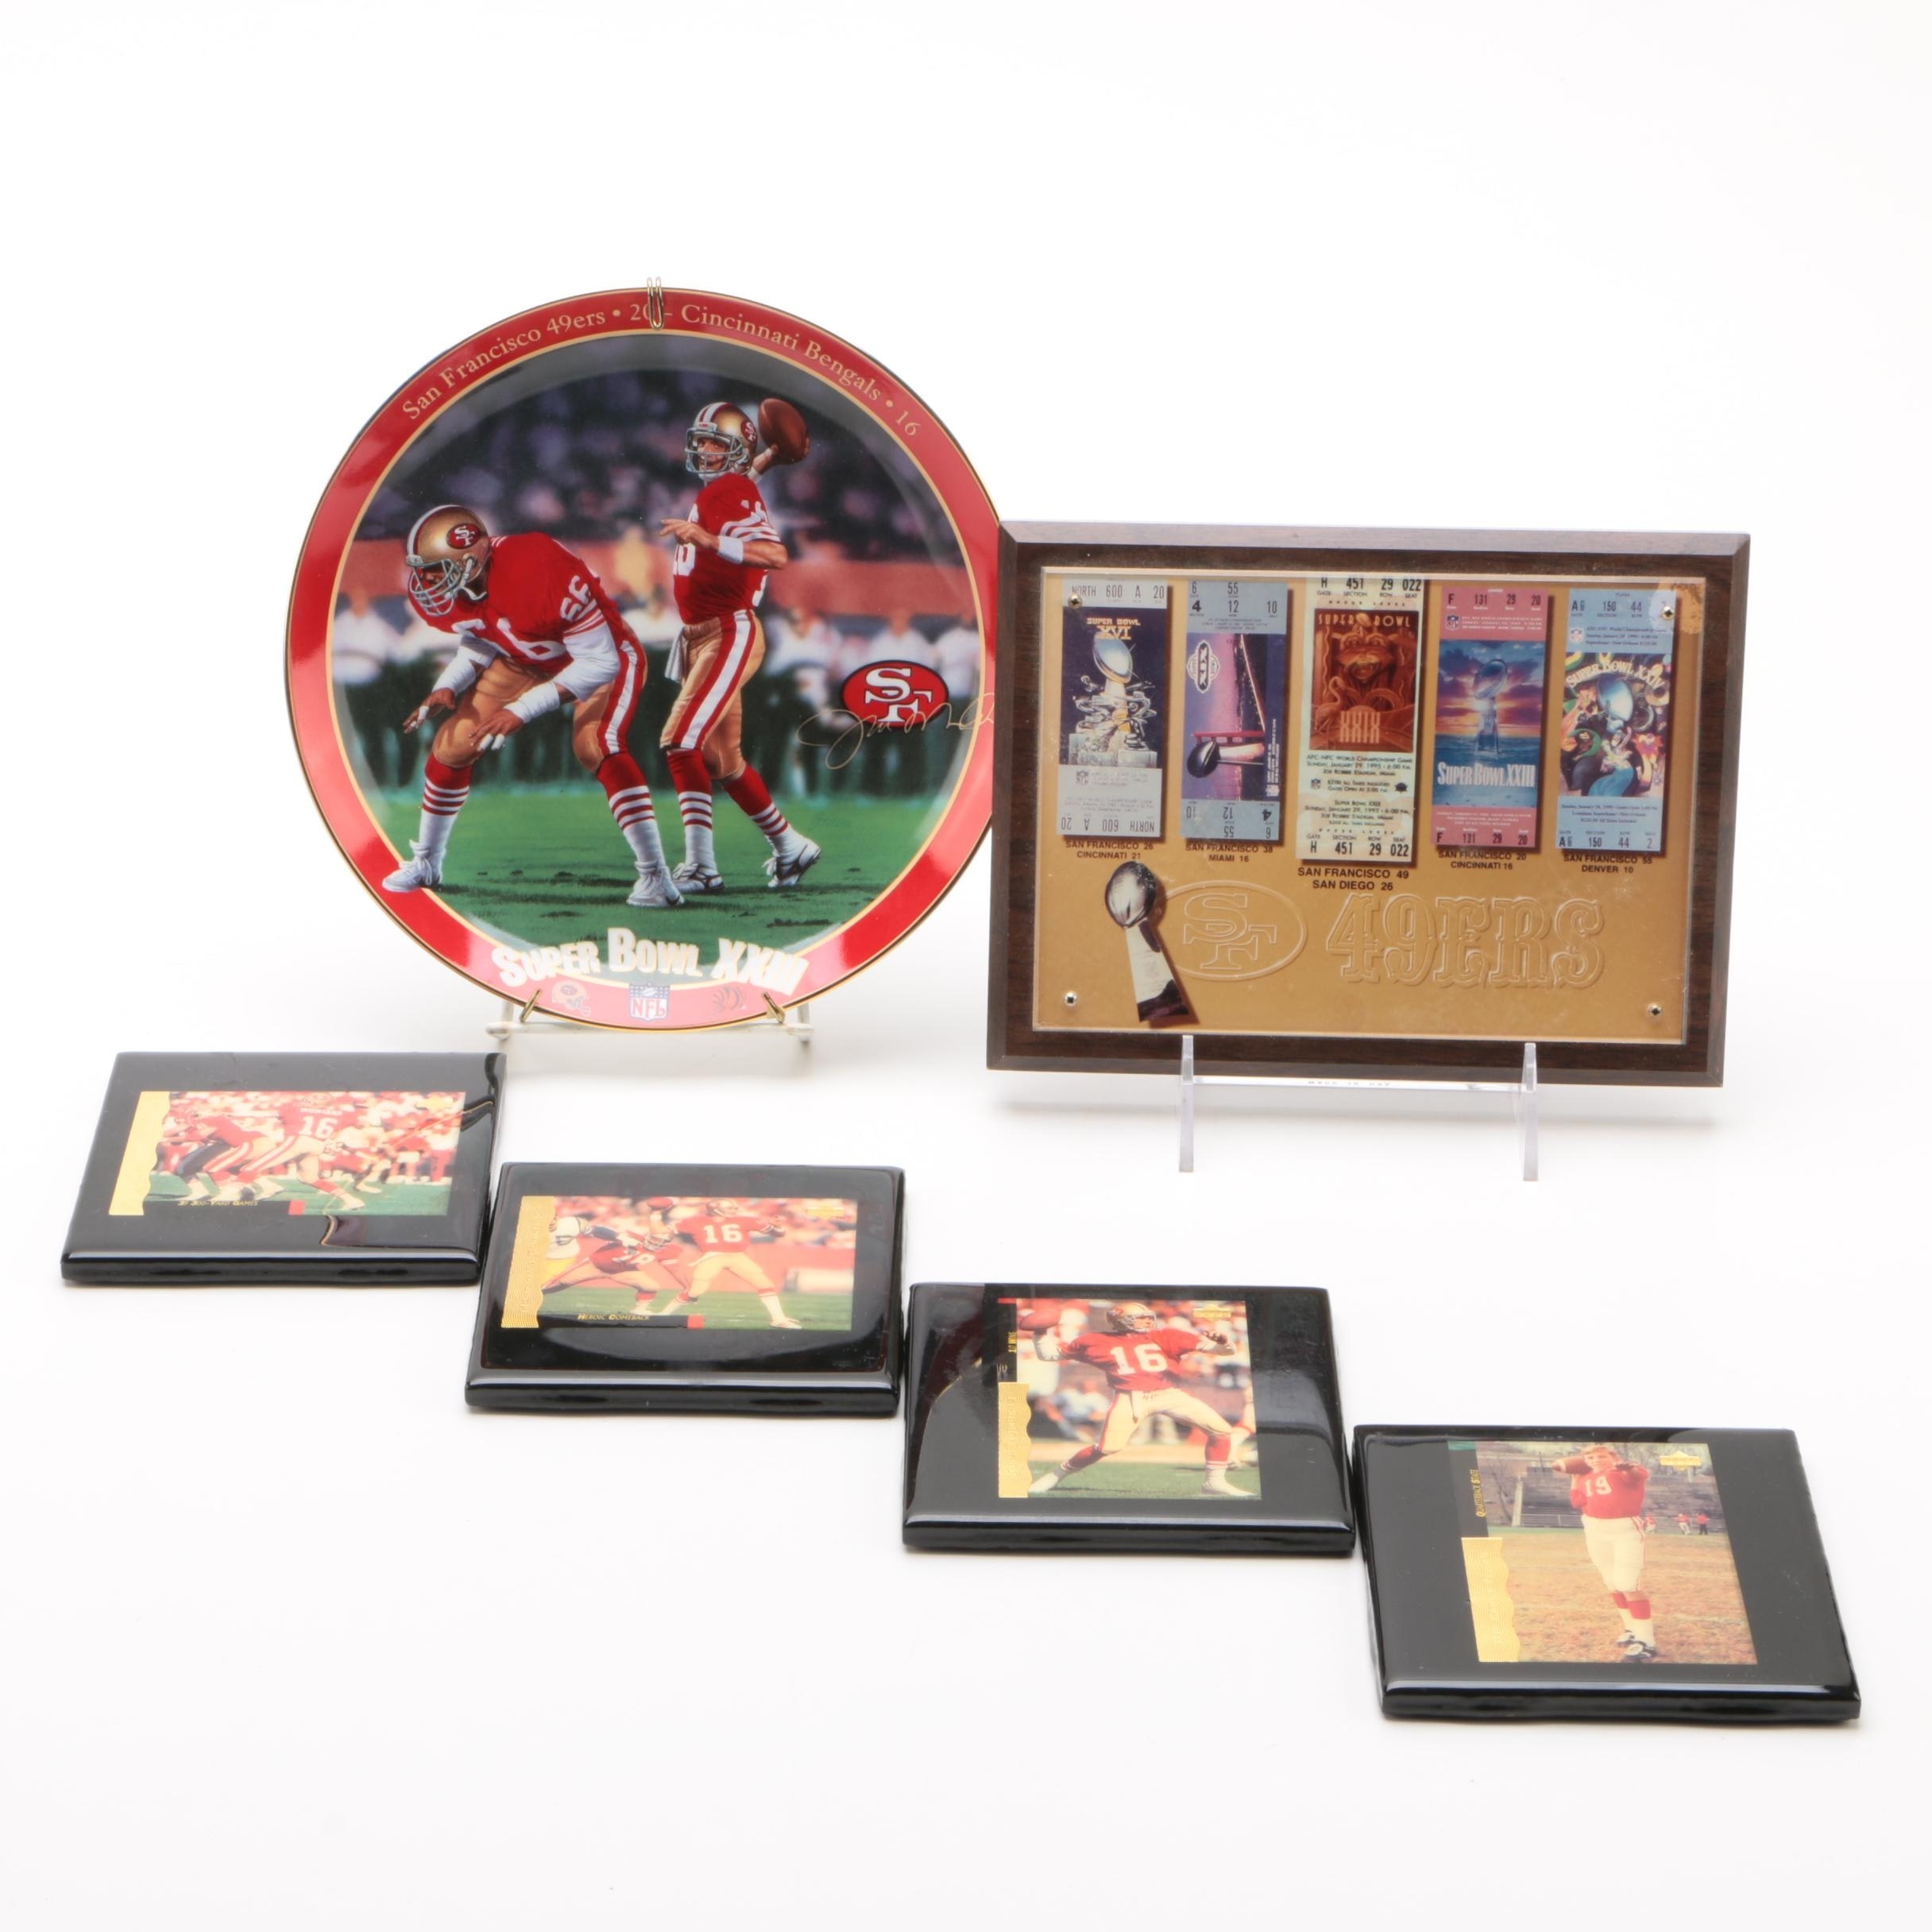 San Francisco 49ers Super Bowl Memorabilia and Coasters